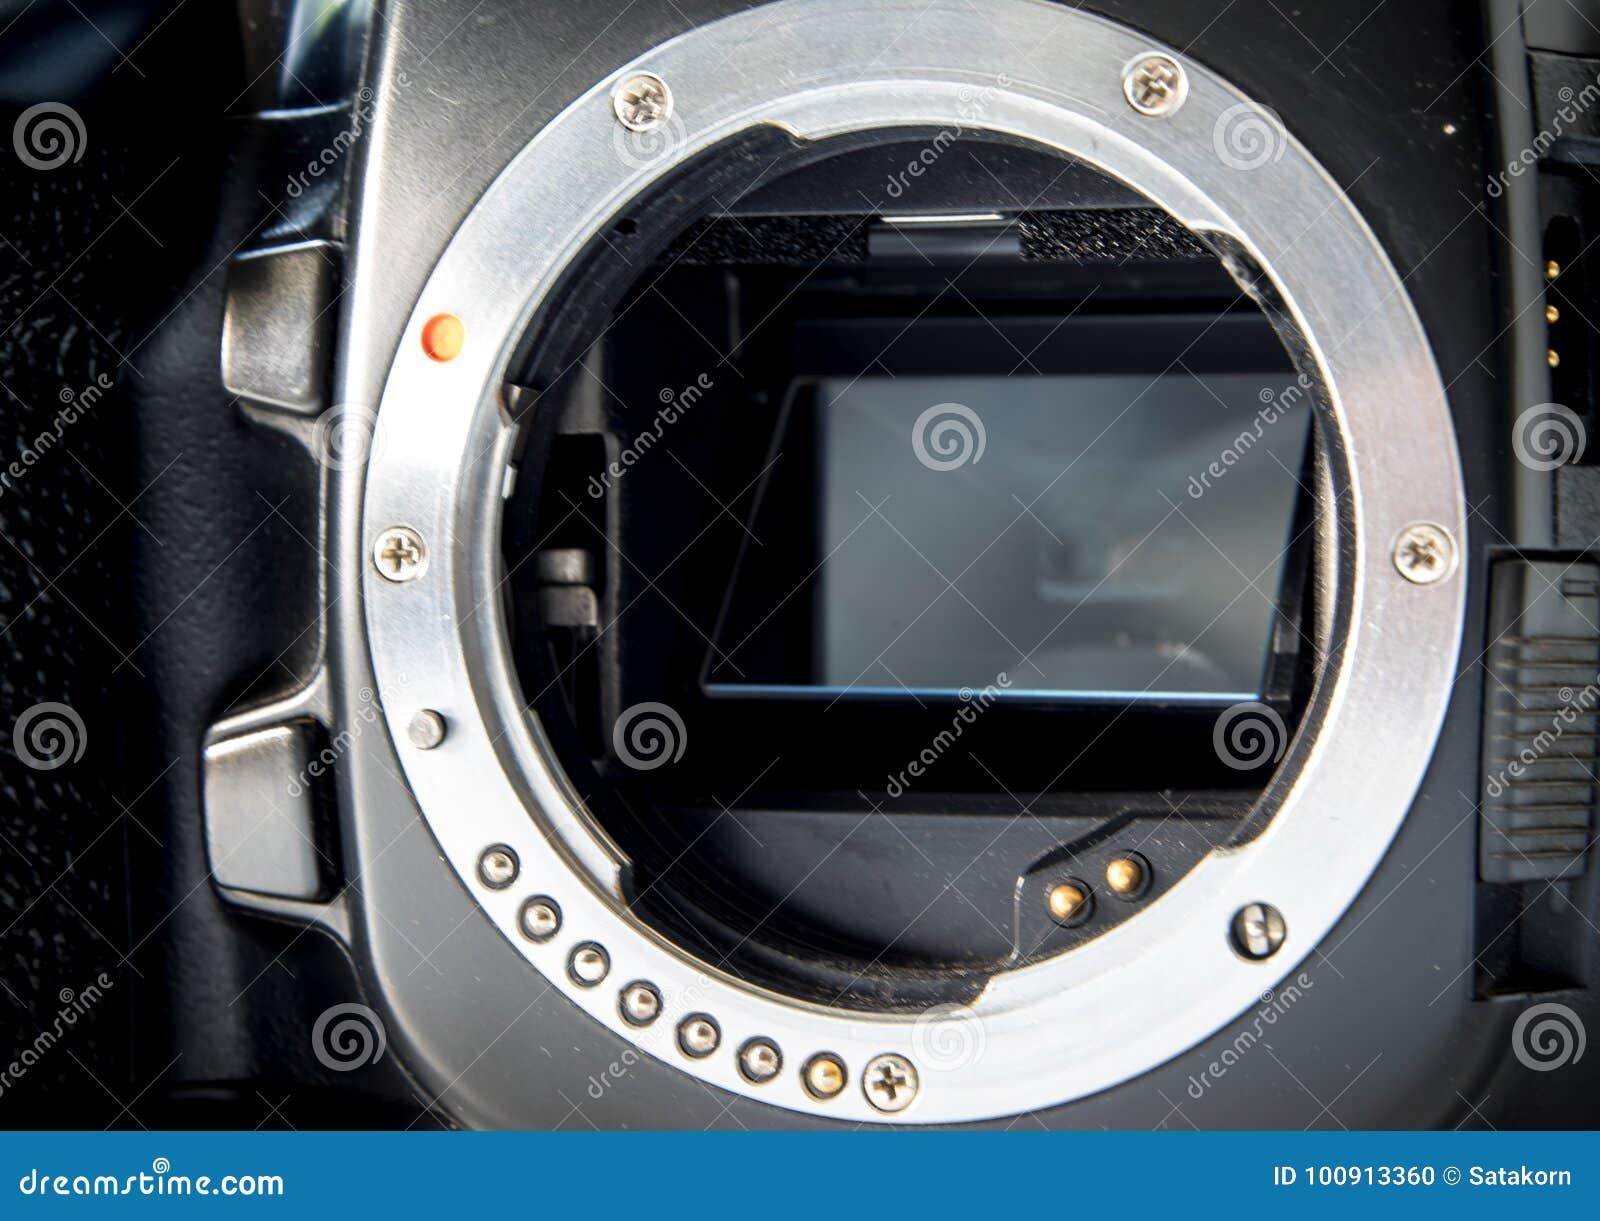 SLR camera body metal bayonet lens mount without lens